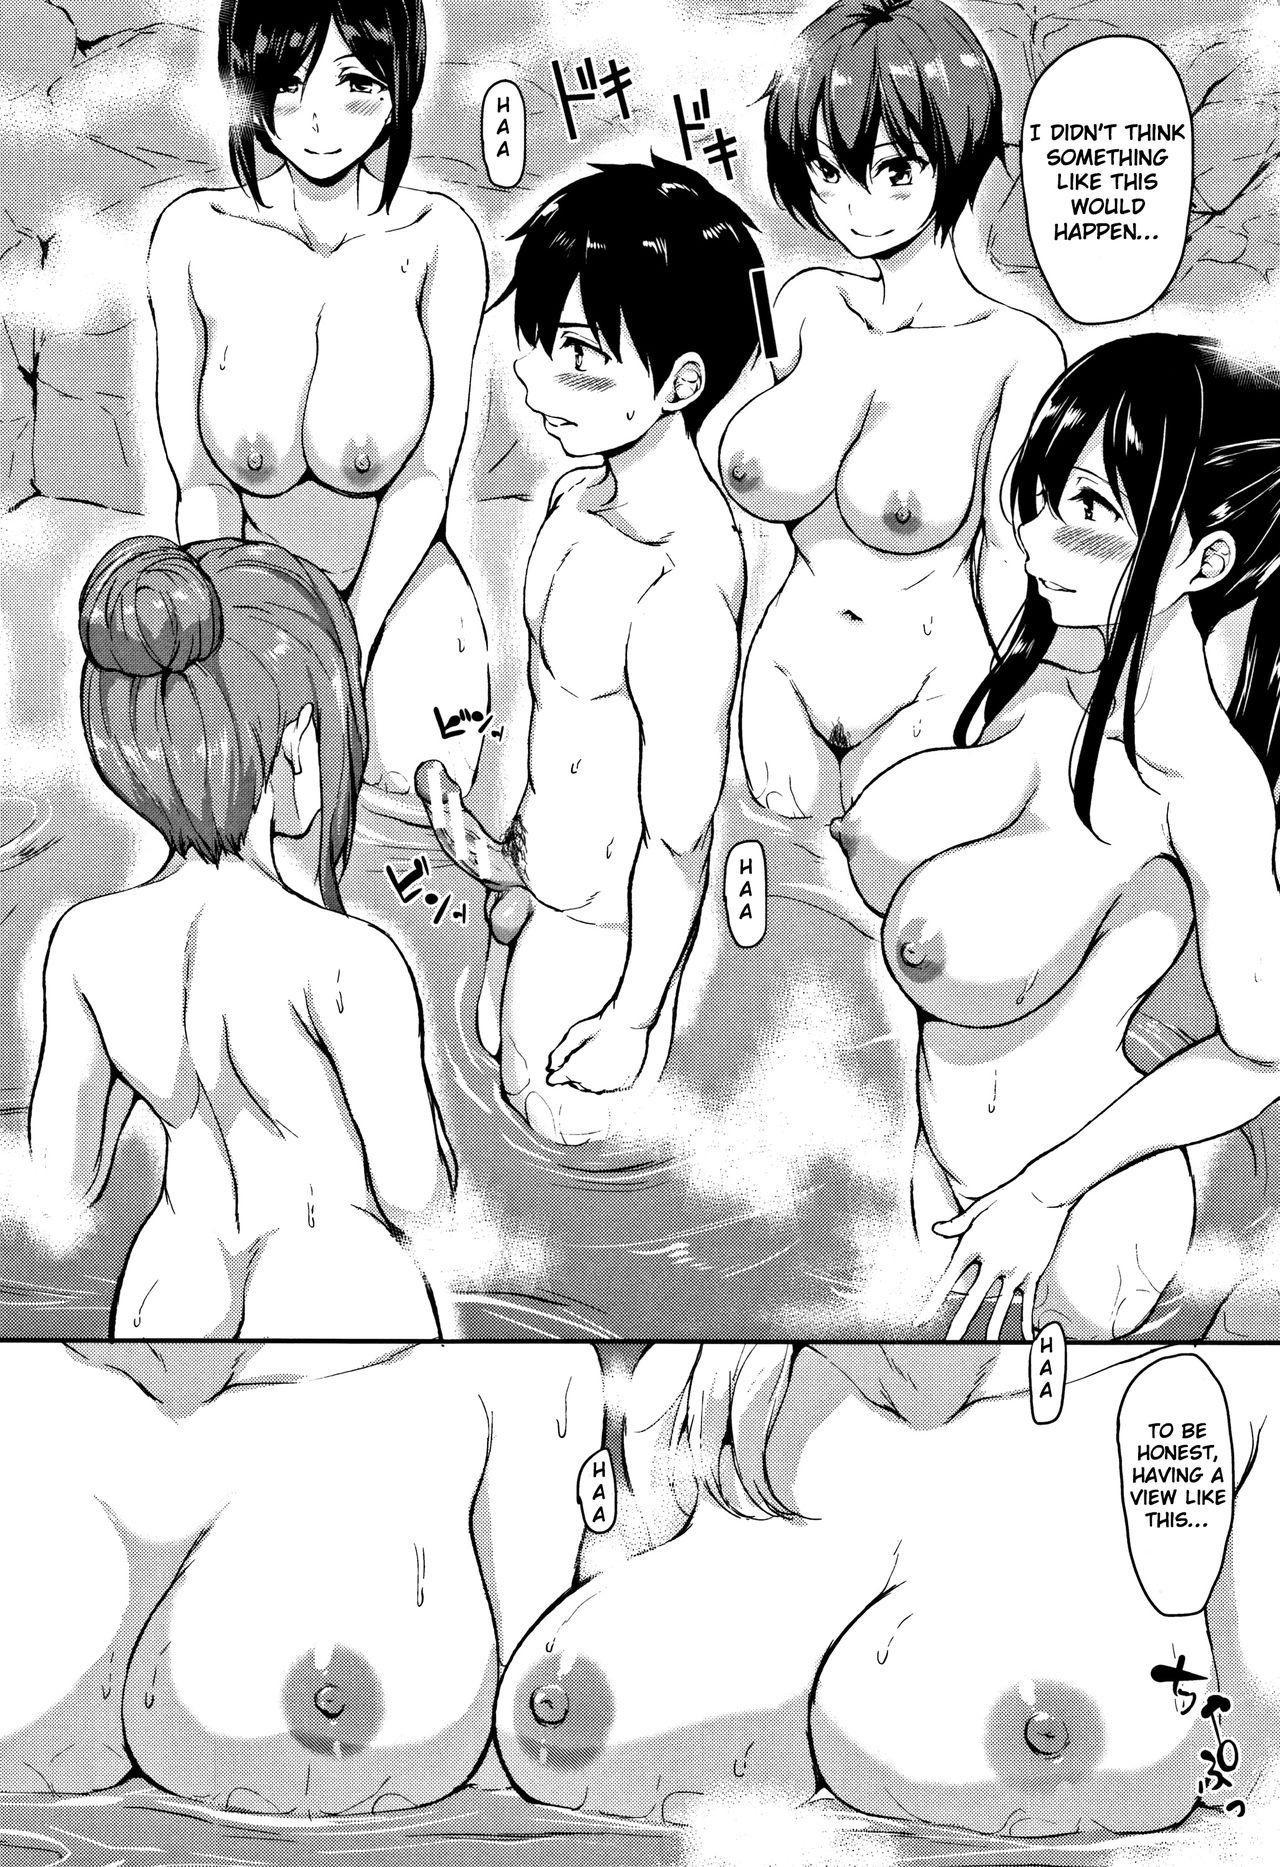 Yukemuri Harem Monogatari Saishuuwa   Yukemuri Harem Monogatari Final Chapter 7